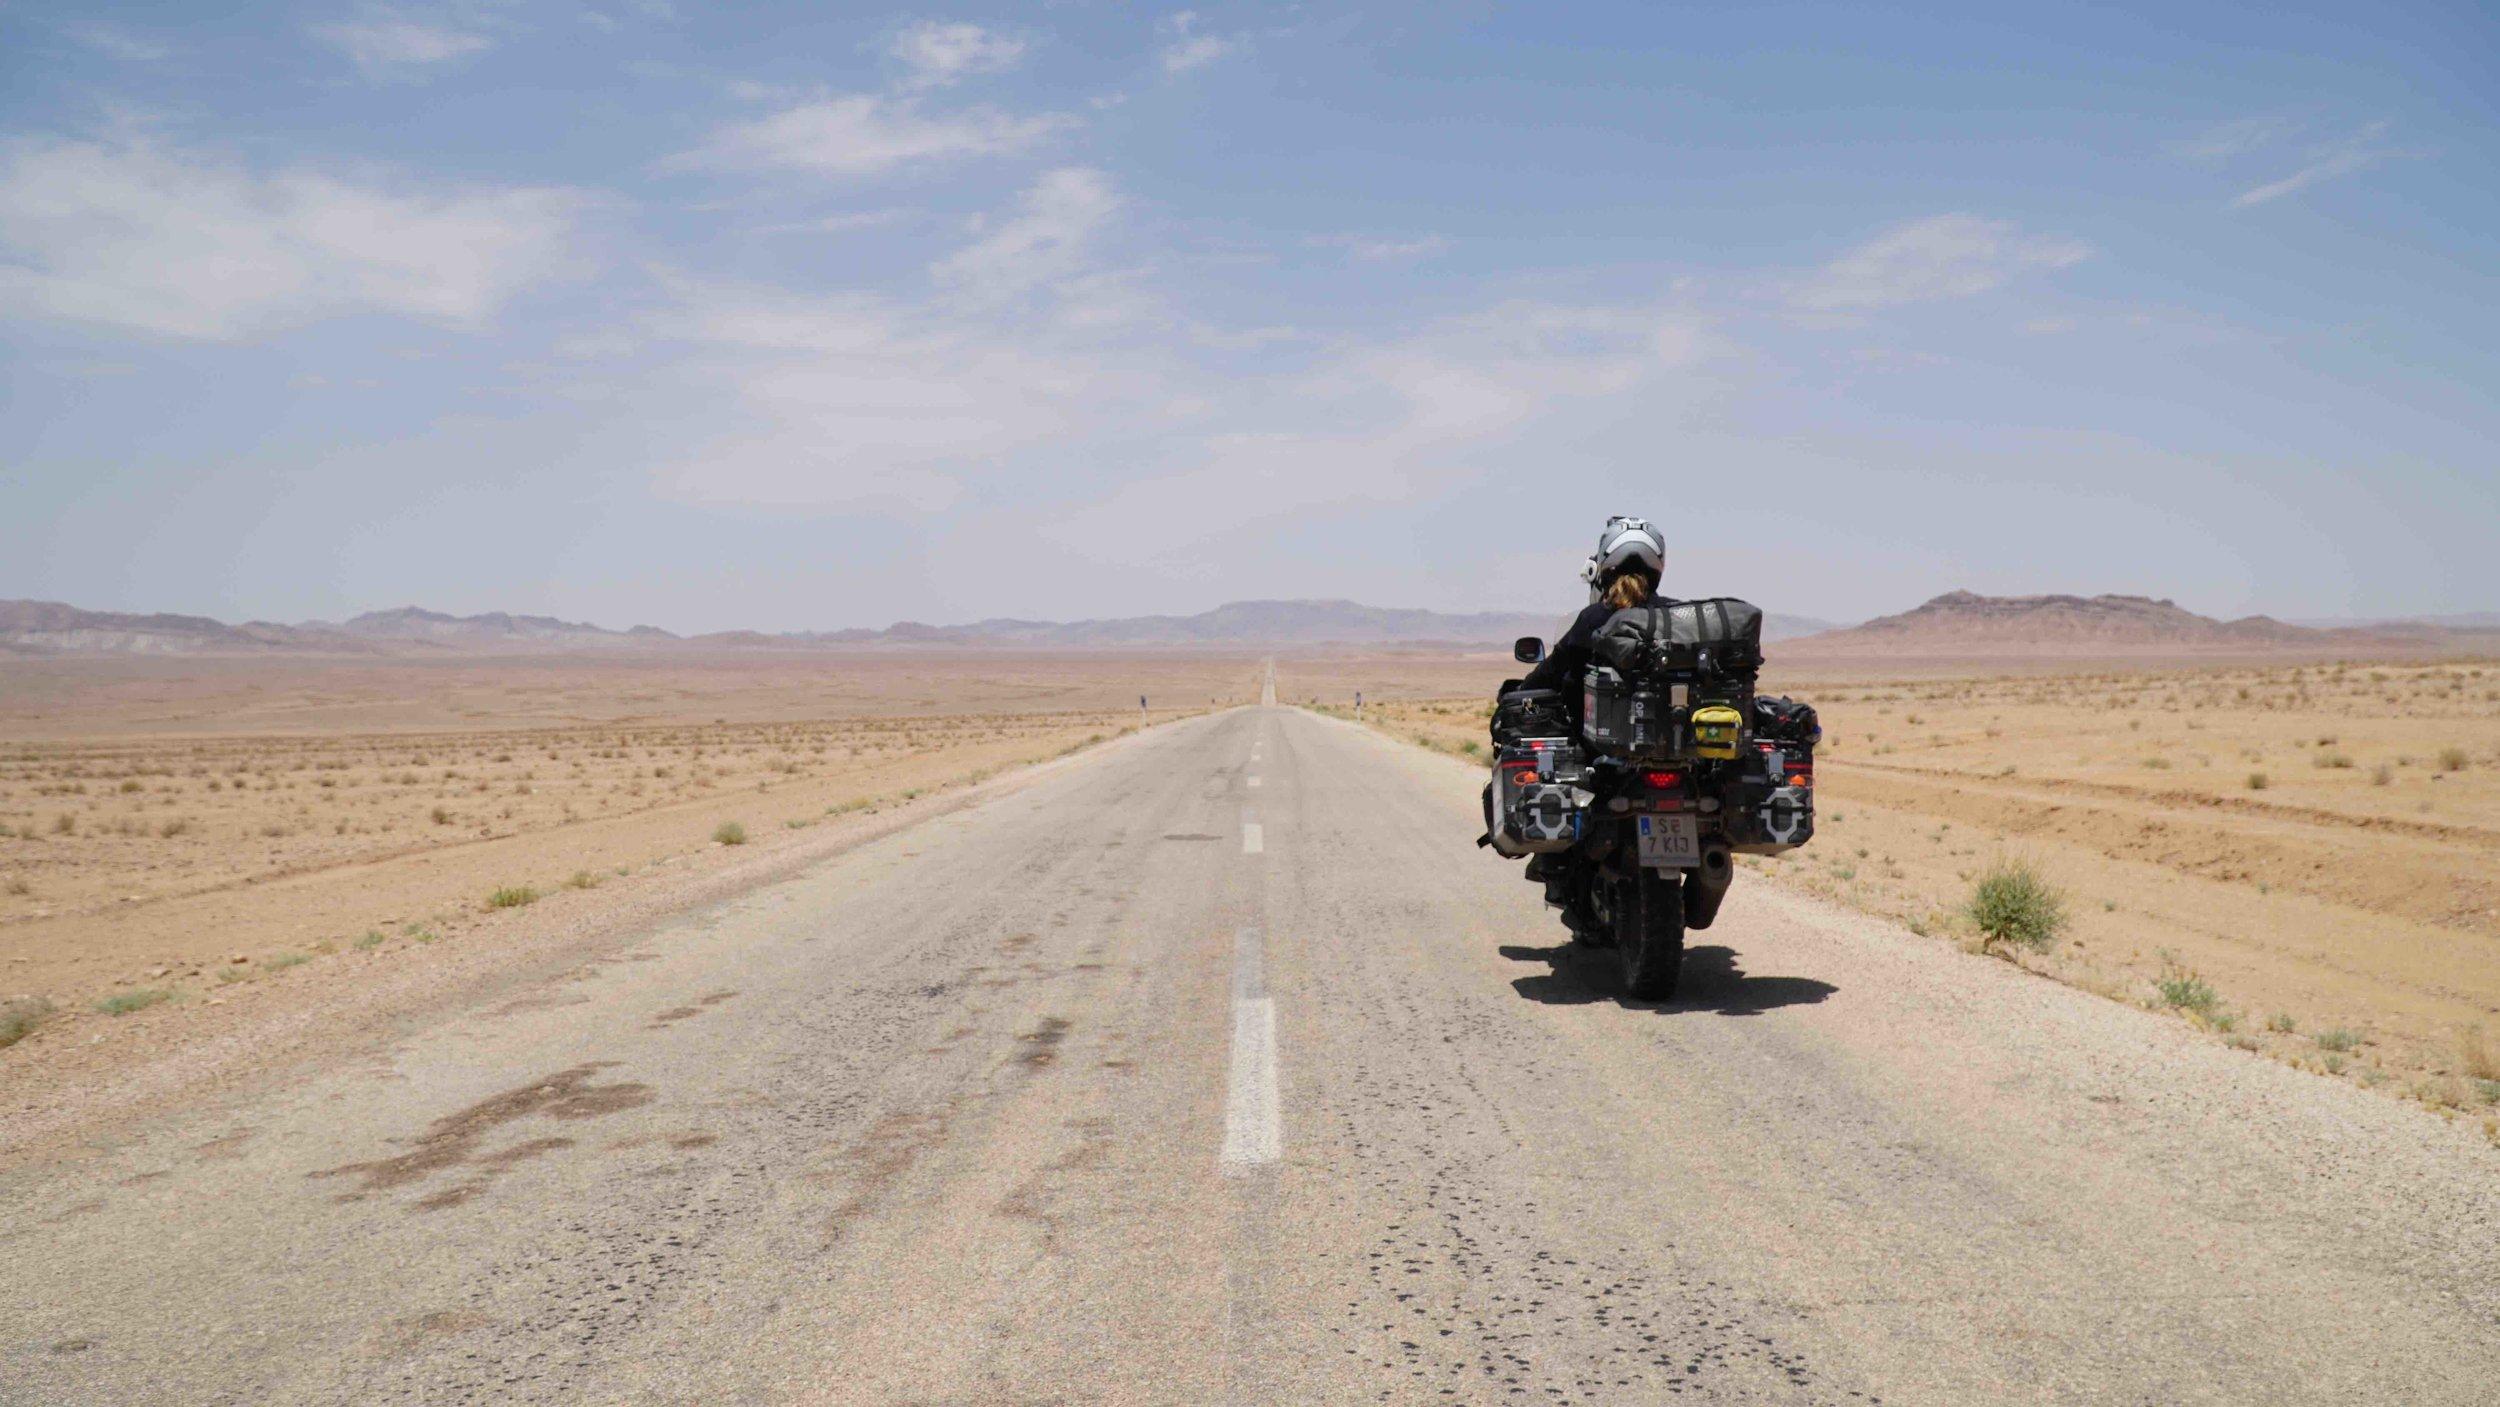 Riding through the desert of Iran